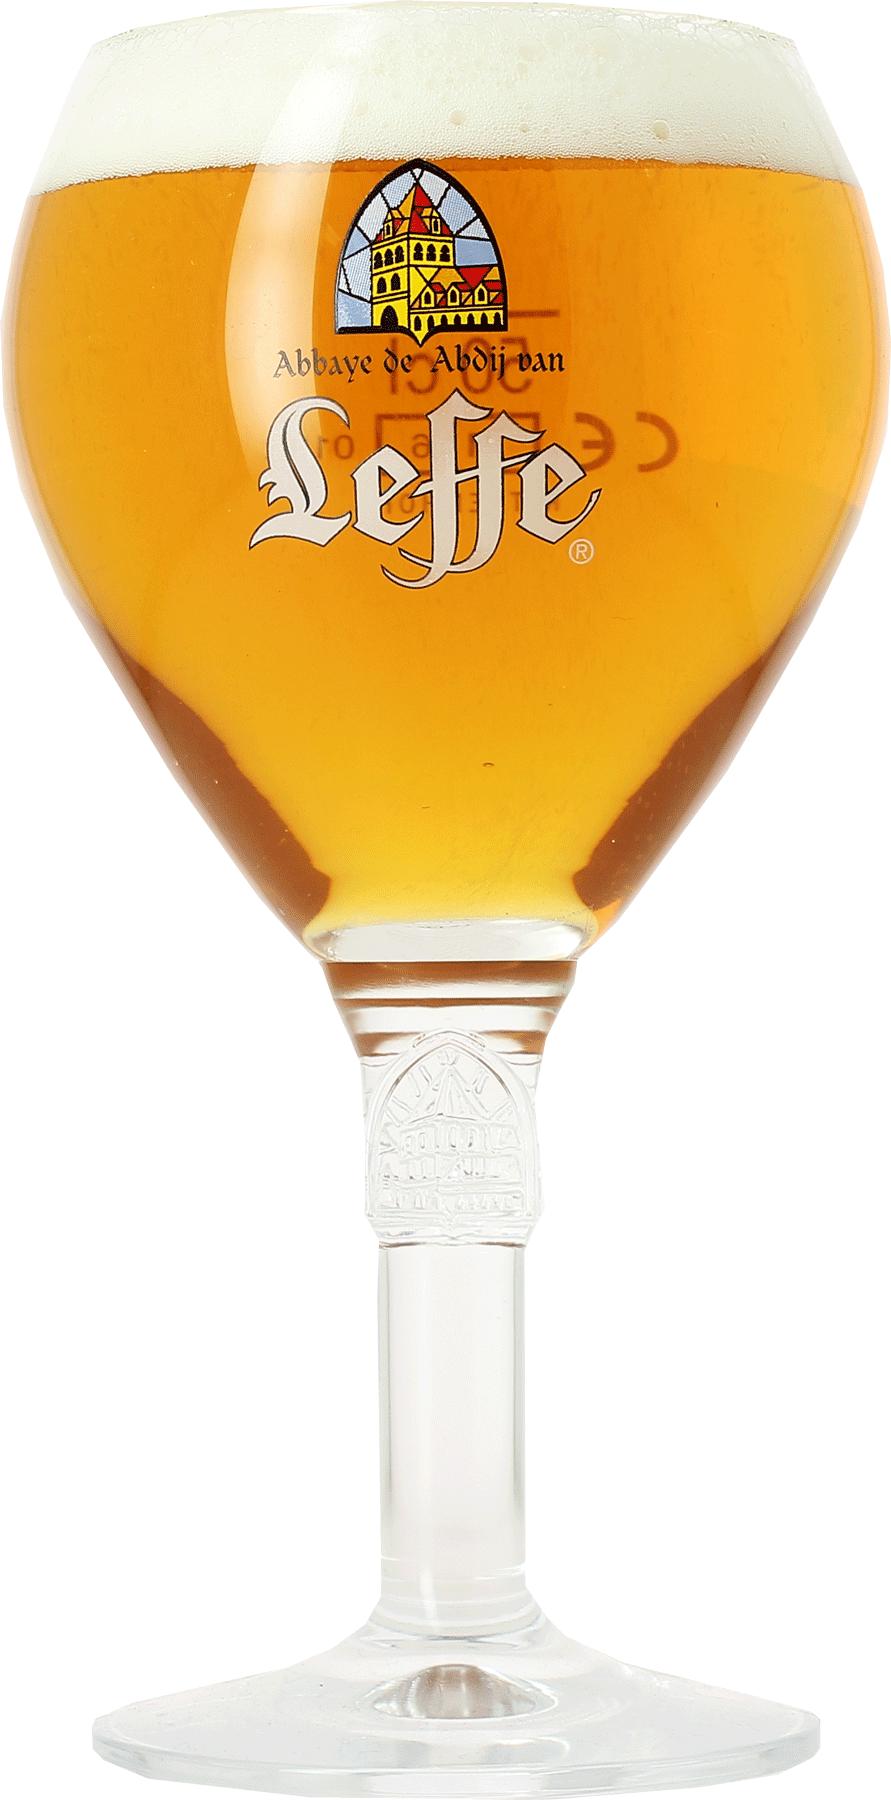 Vaso caliz Leffe - 50cl